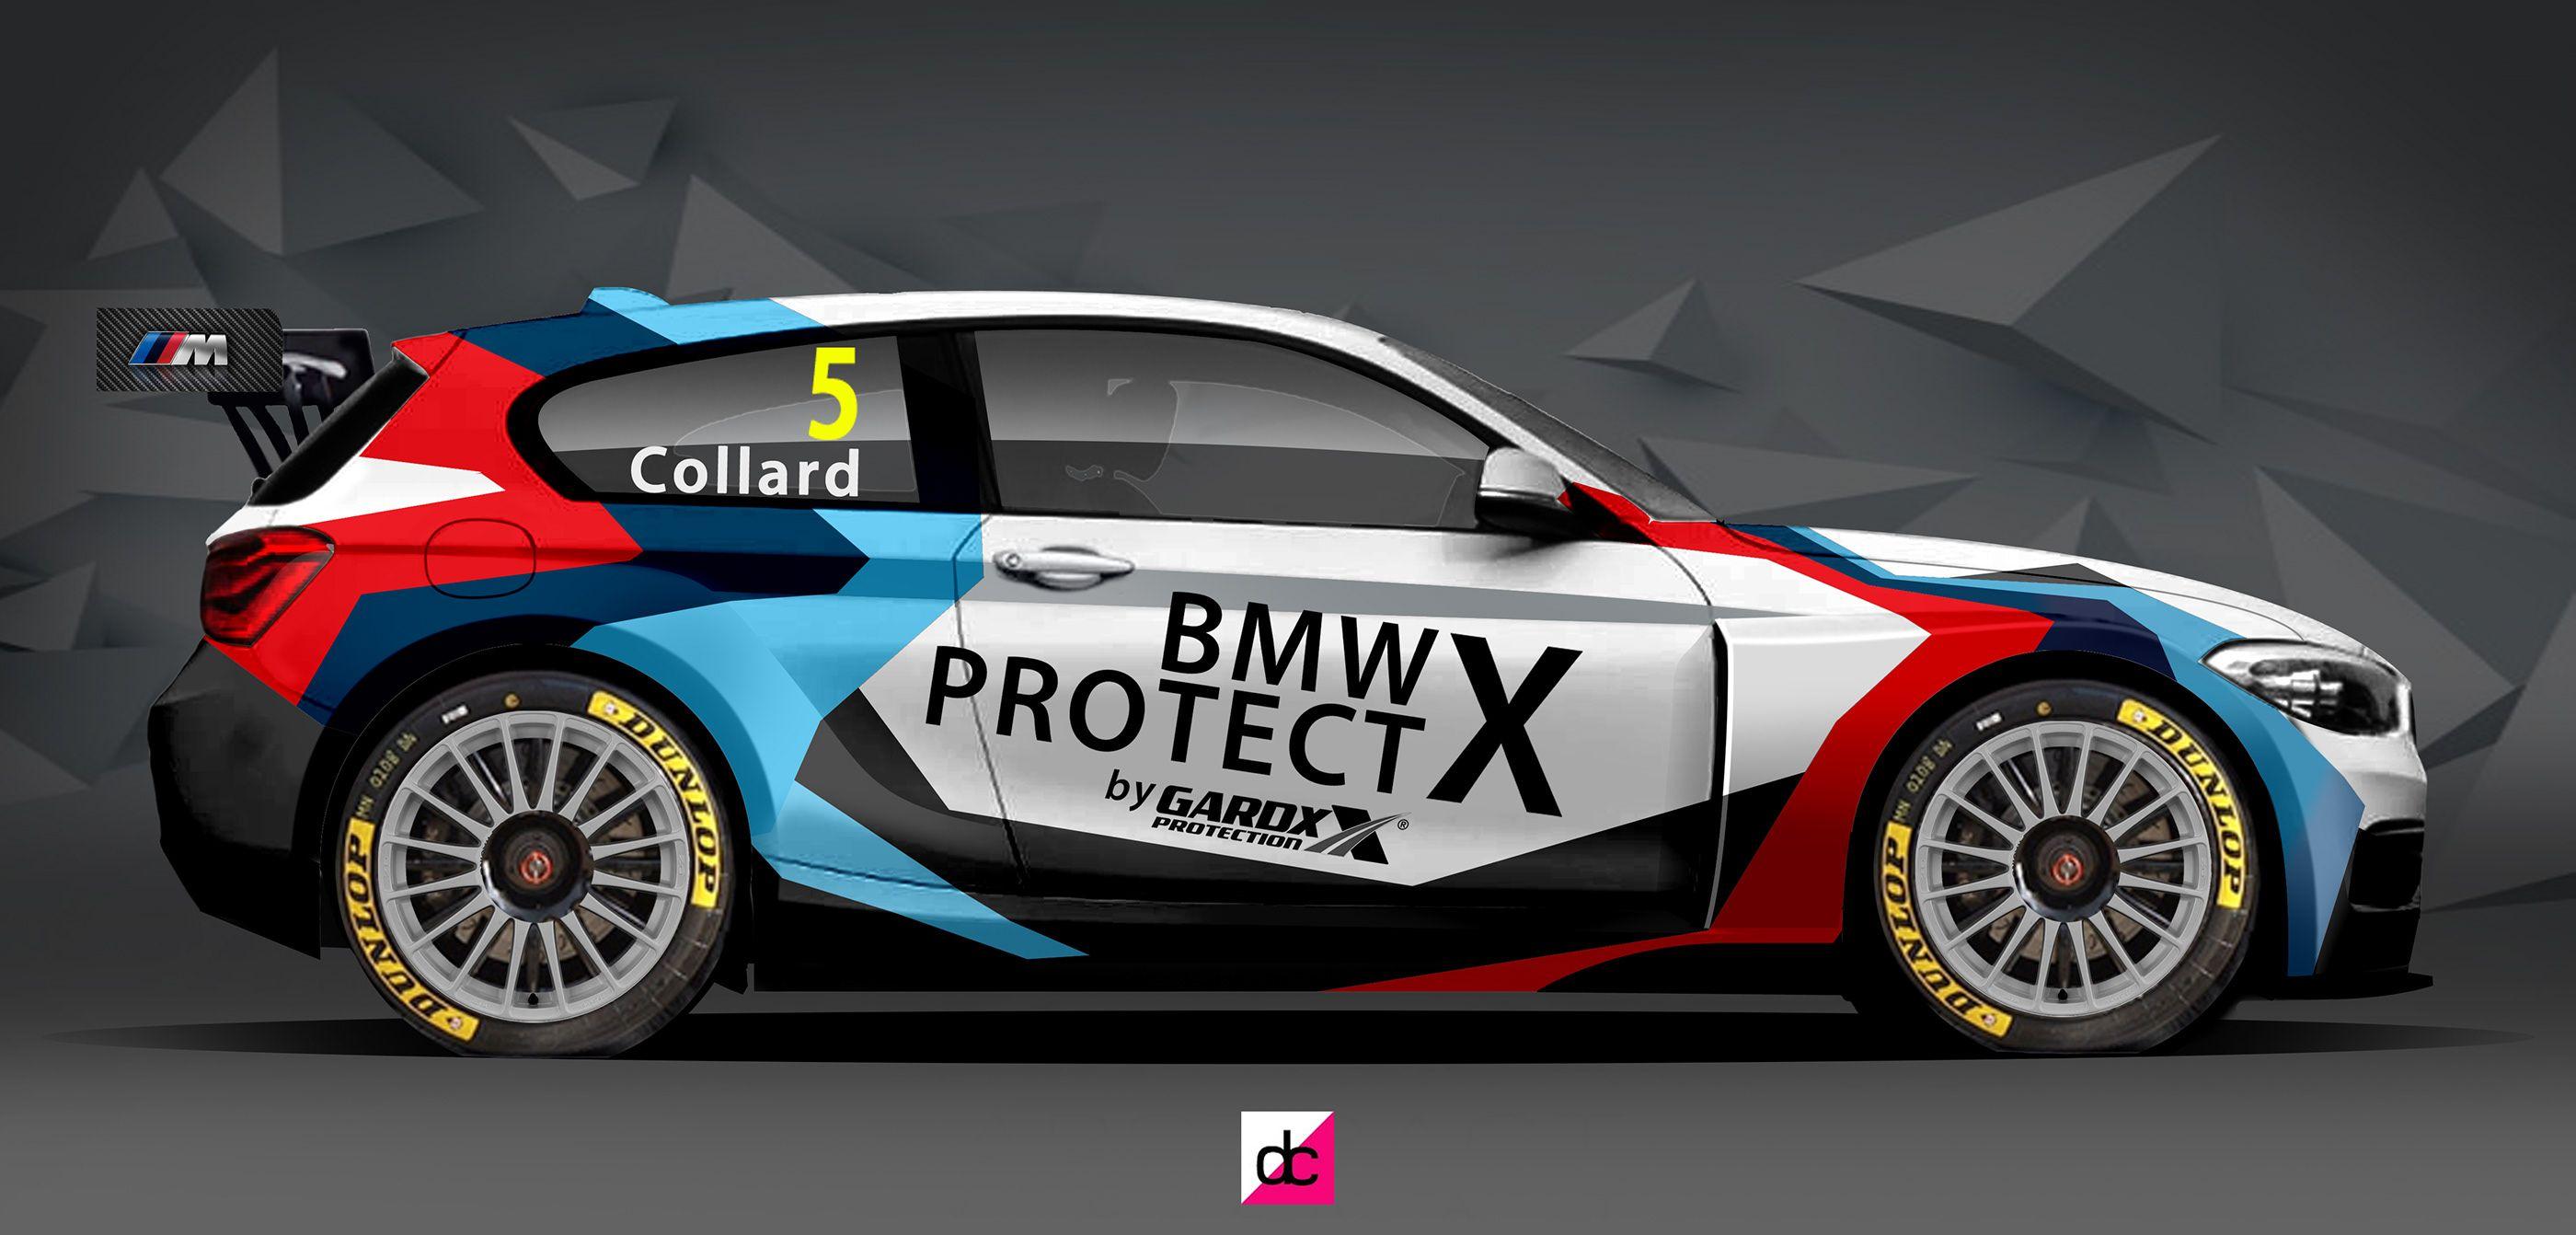 Wsr Bmw Racing Btcc Livery Proposals On Behance Avec Images